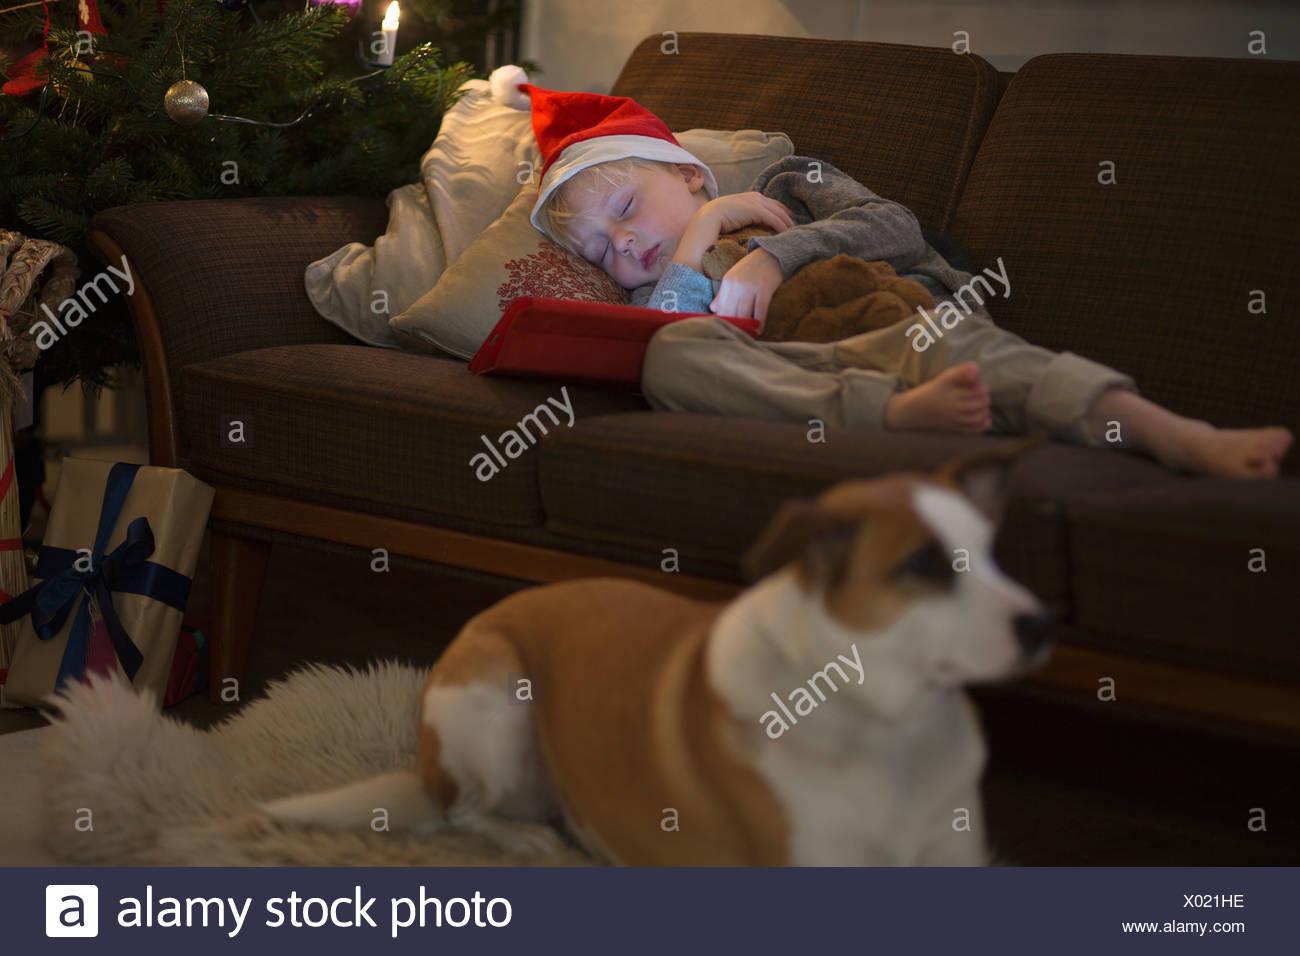 Boy in Santa hat sleeping on sofa - Stock Image